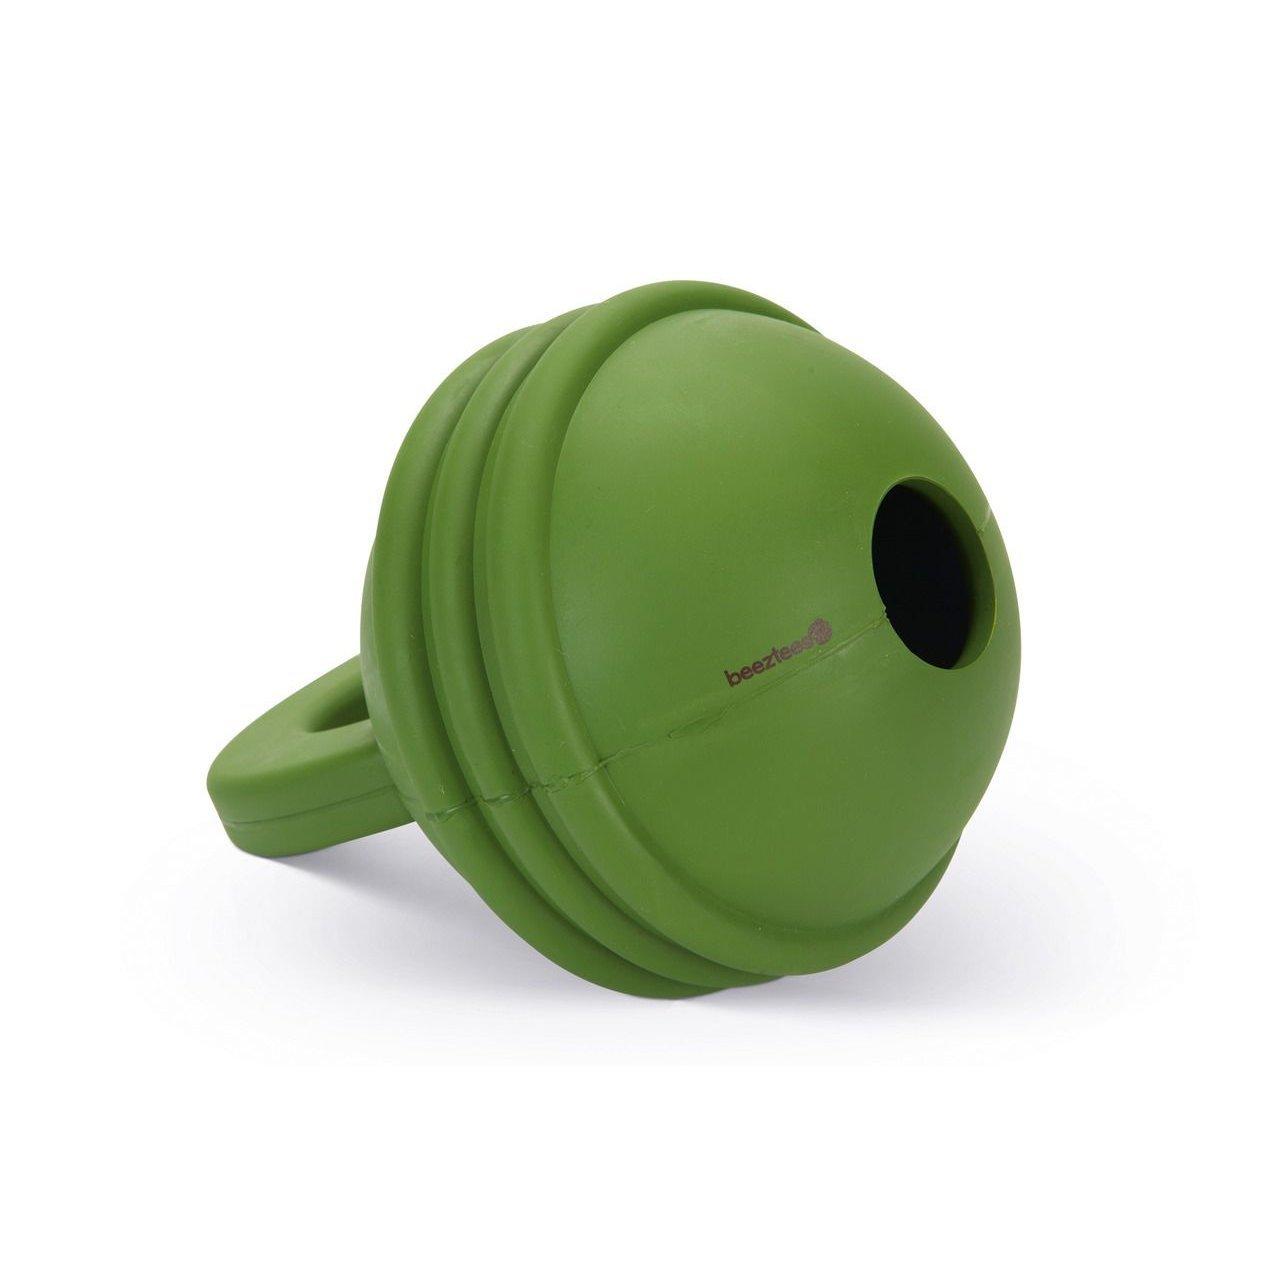 Beeztees Sumo Play Kettlebell, 16 x 12 x 12 cm, grün